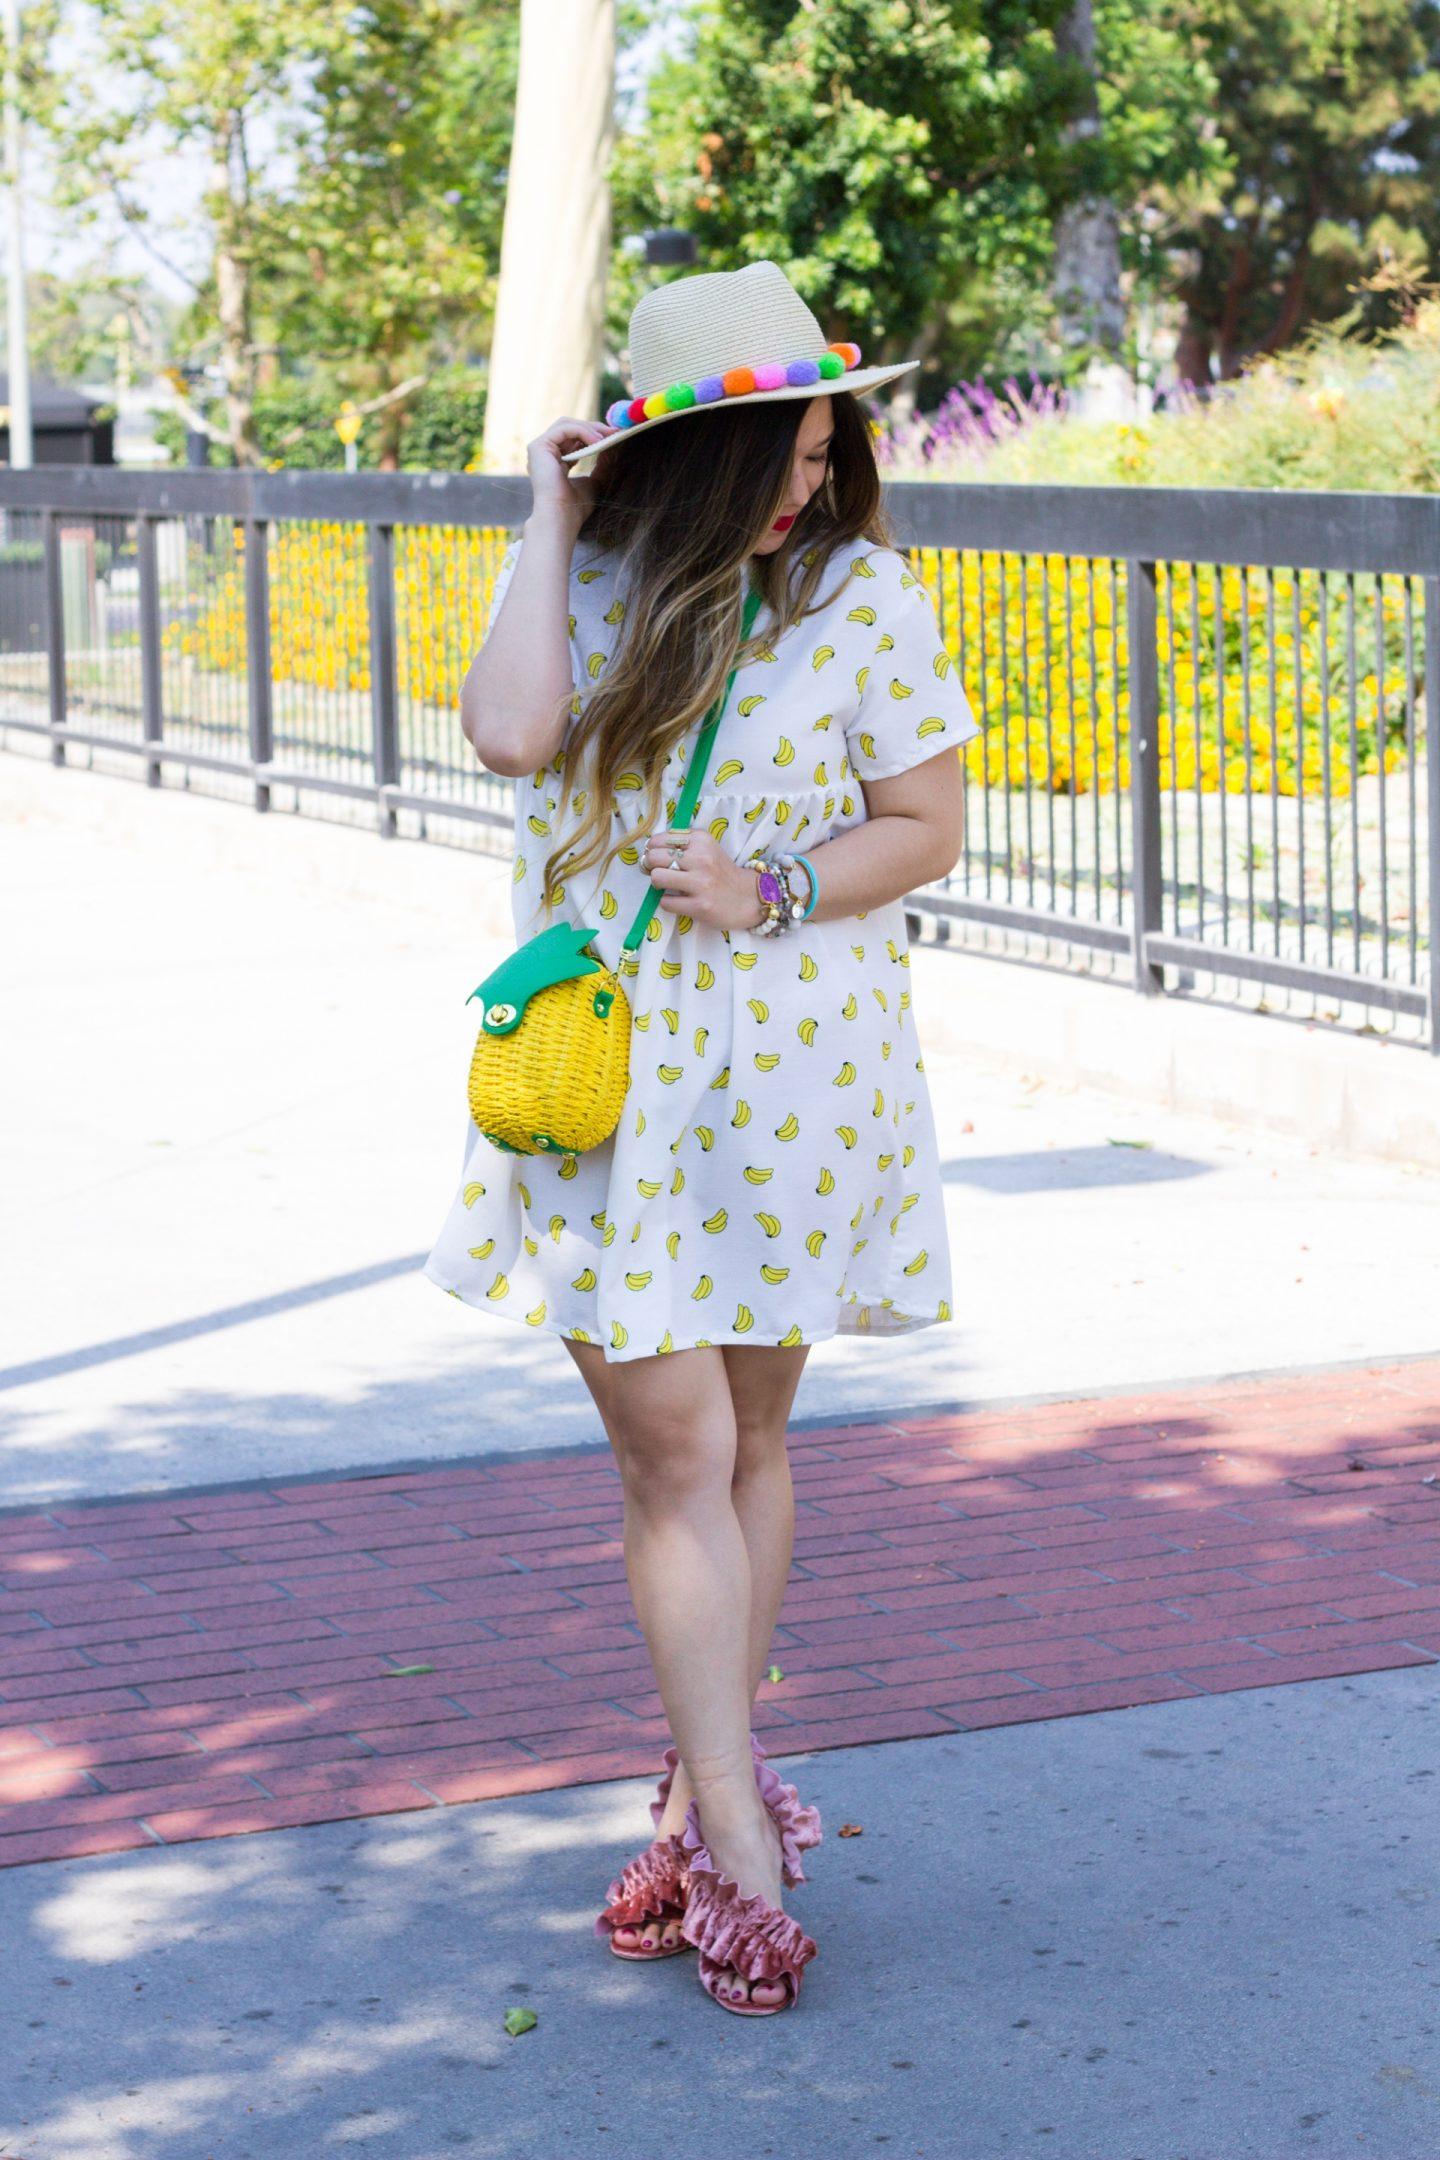 Fruit Fashion Trend: Banana Print Dress + Pineapple Bag